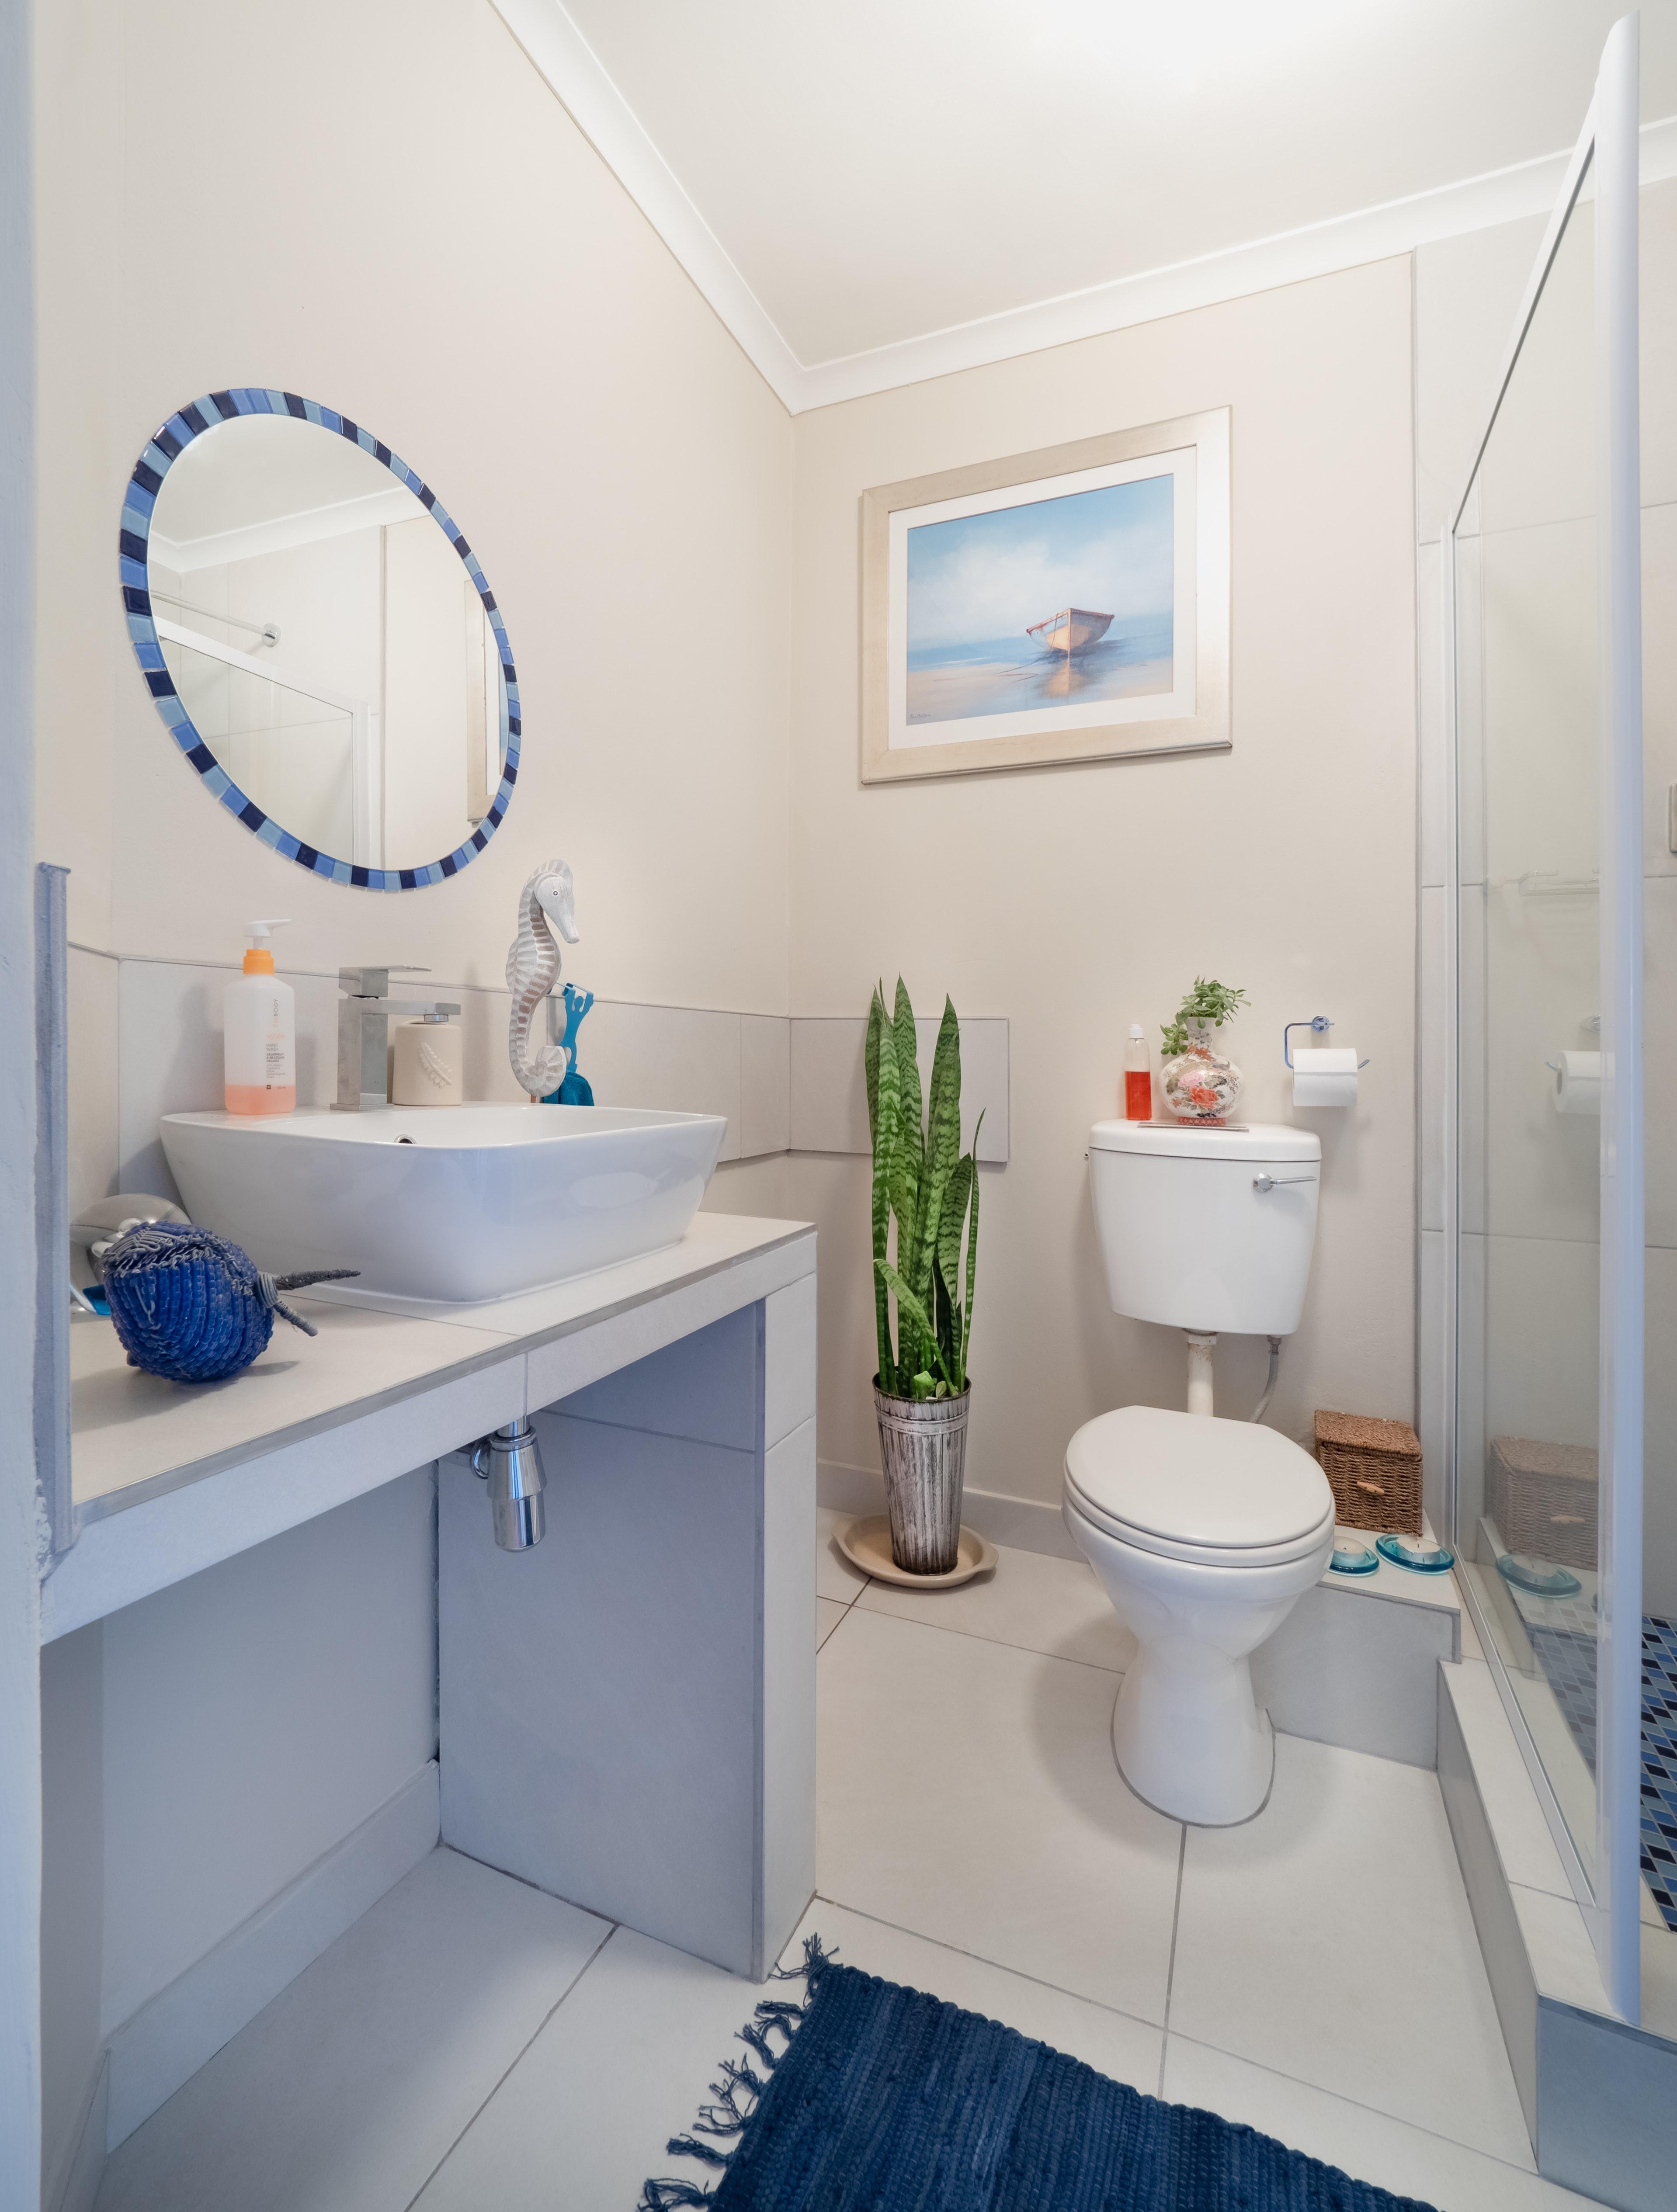 Gambar kamar mandi biru milik desain interior